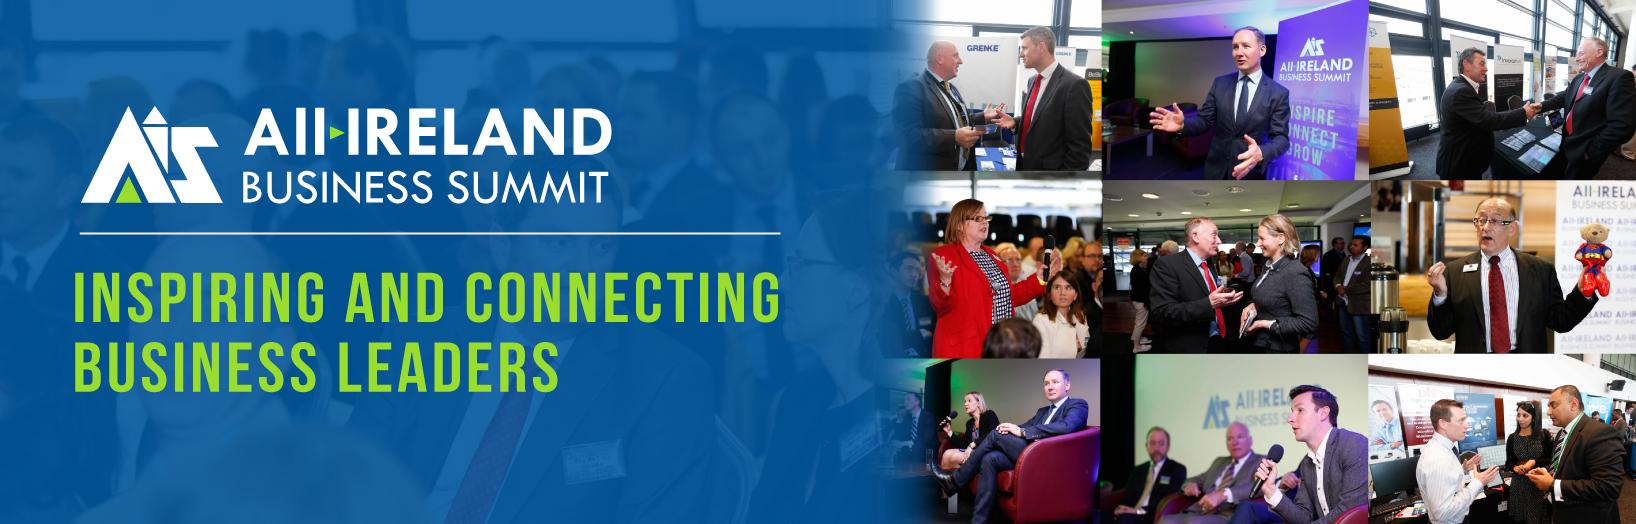 all-ireland-business-summit